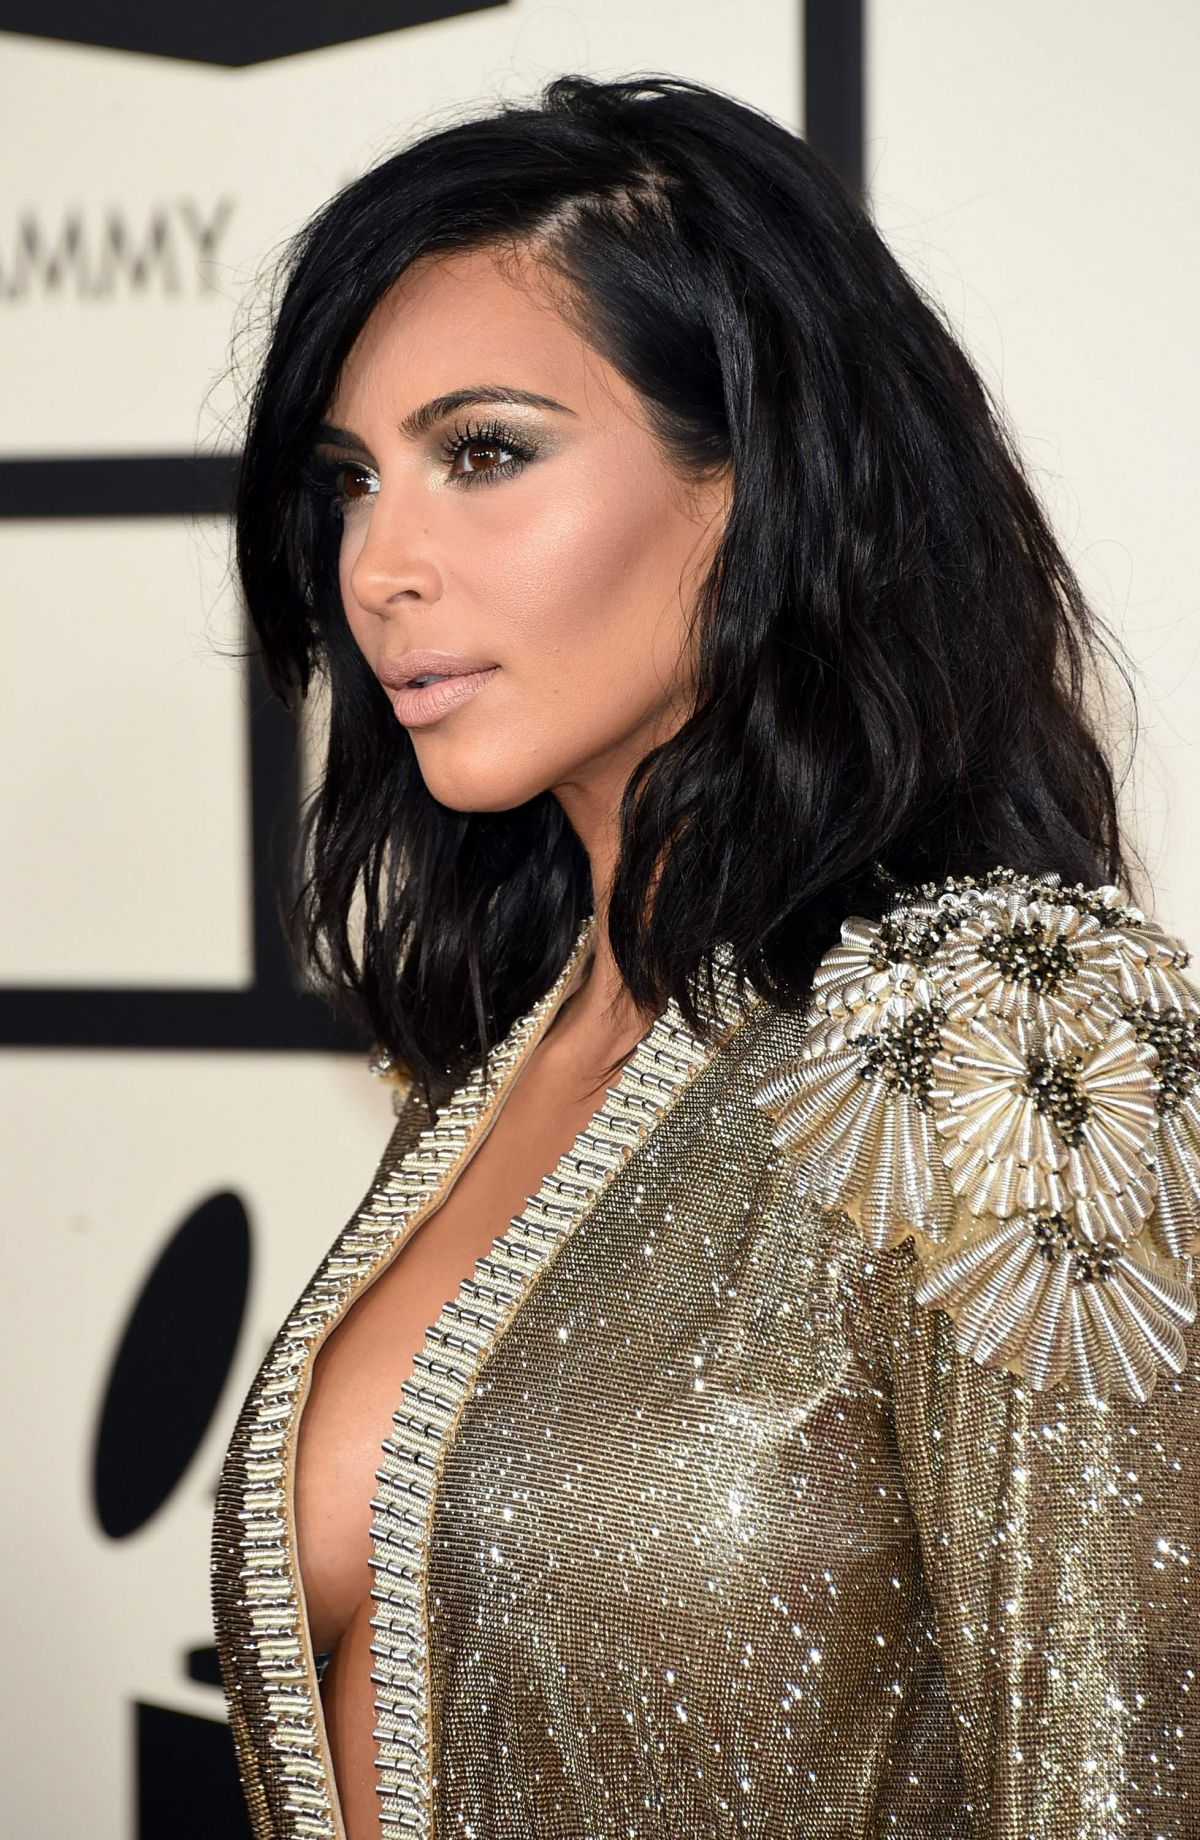 KIM KARDASHIAN at 2015 Grammy Awards in Los Angeles ... Kim Kardashian